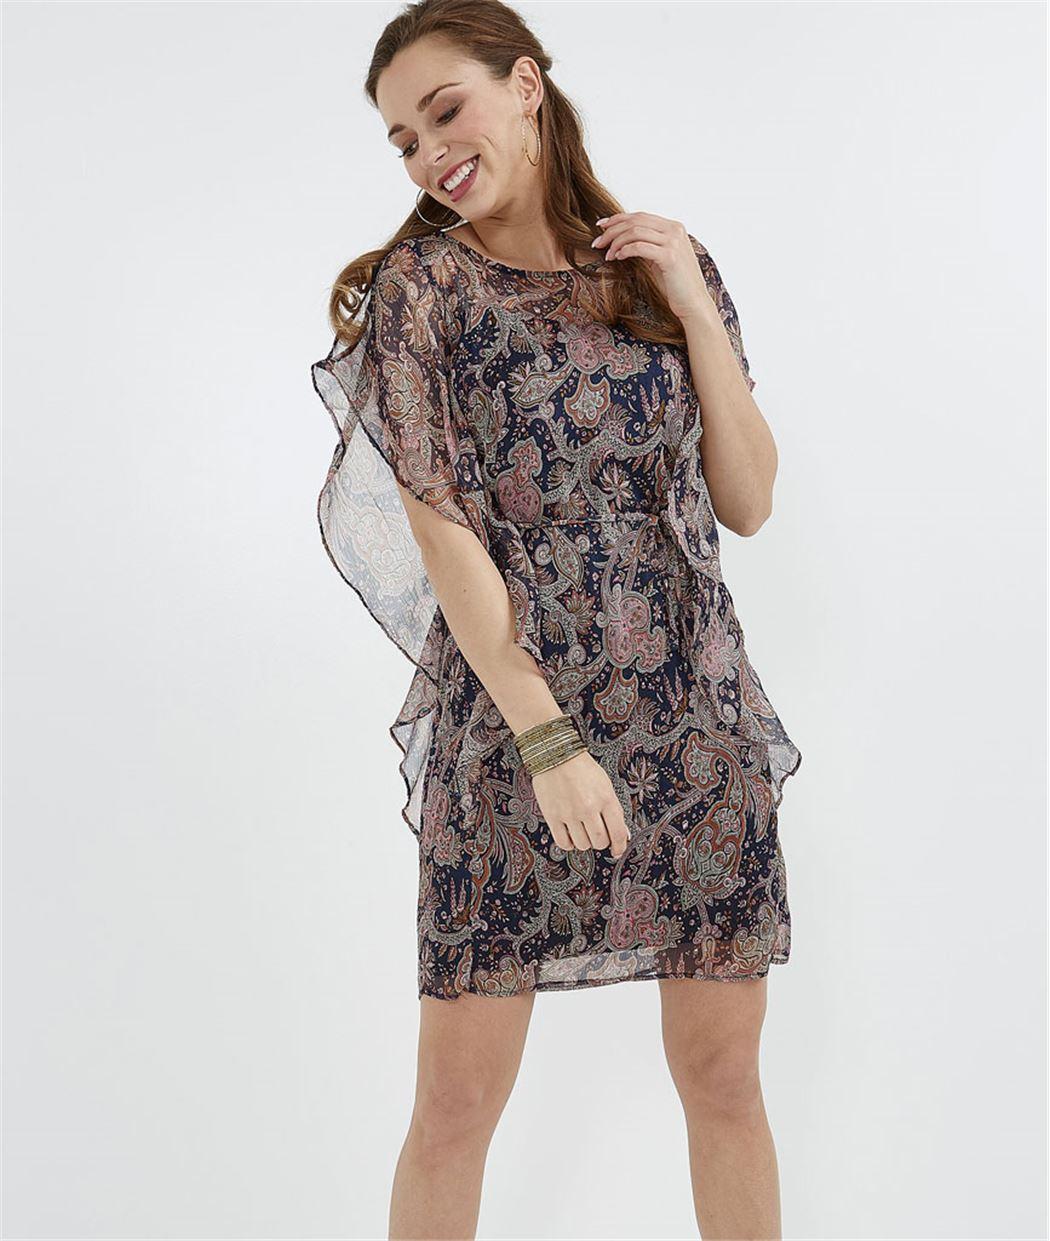 Robe femme imprimée avec volants MARINE